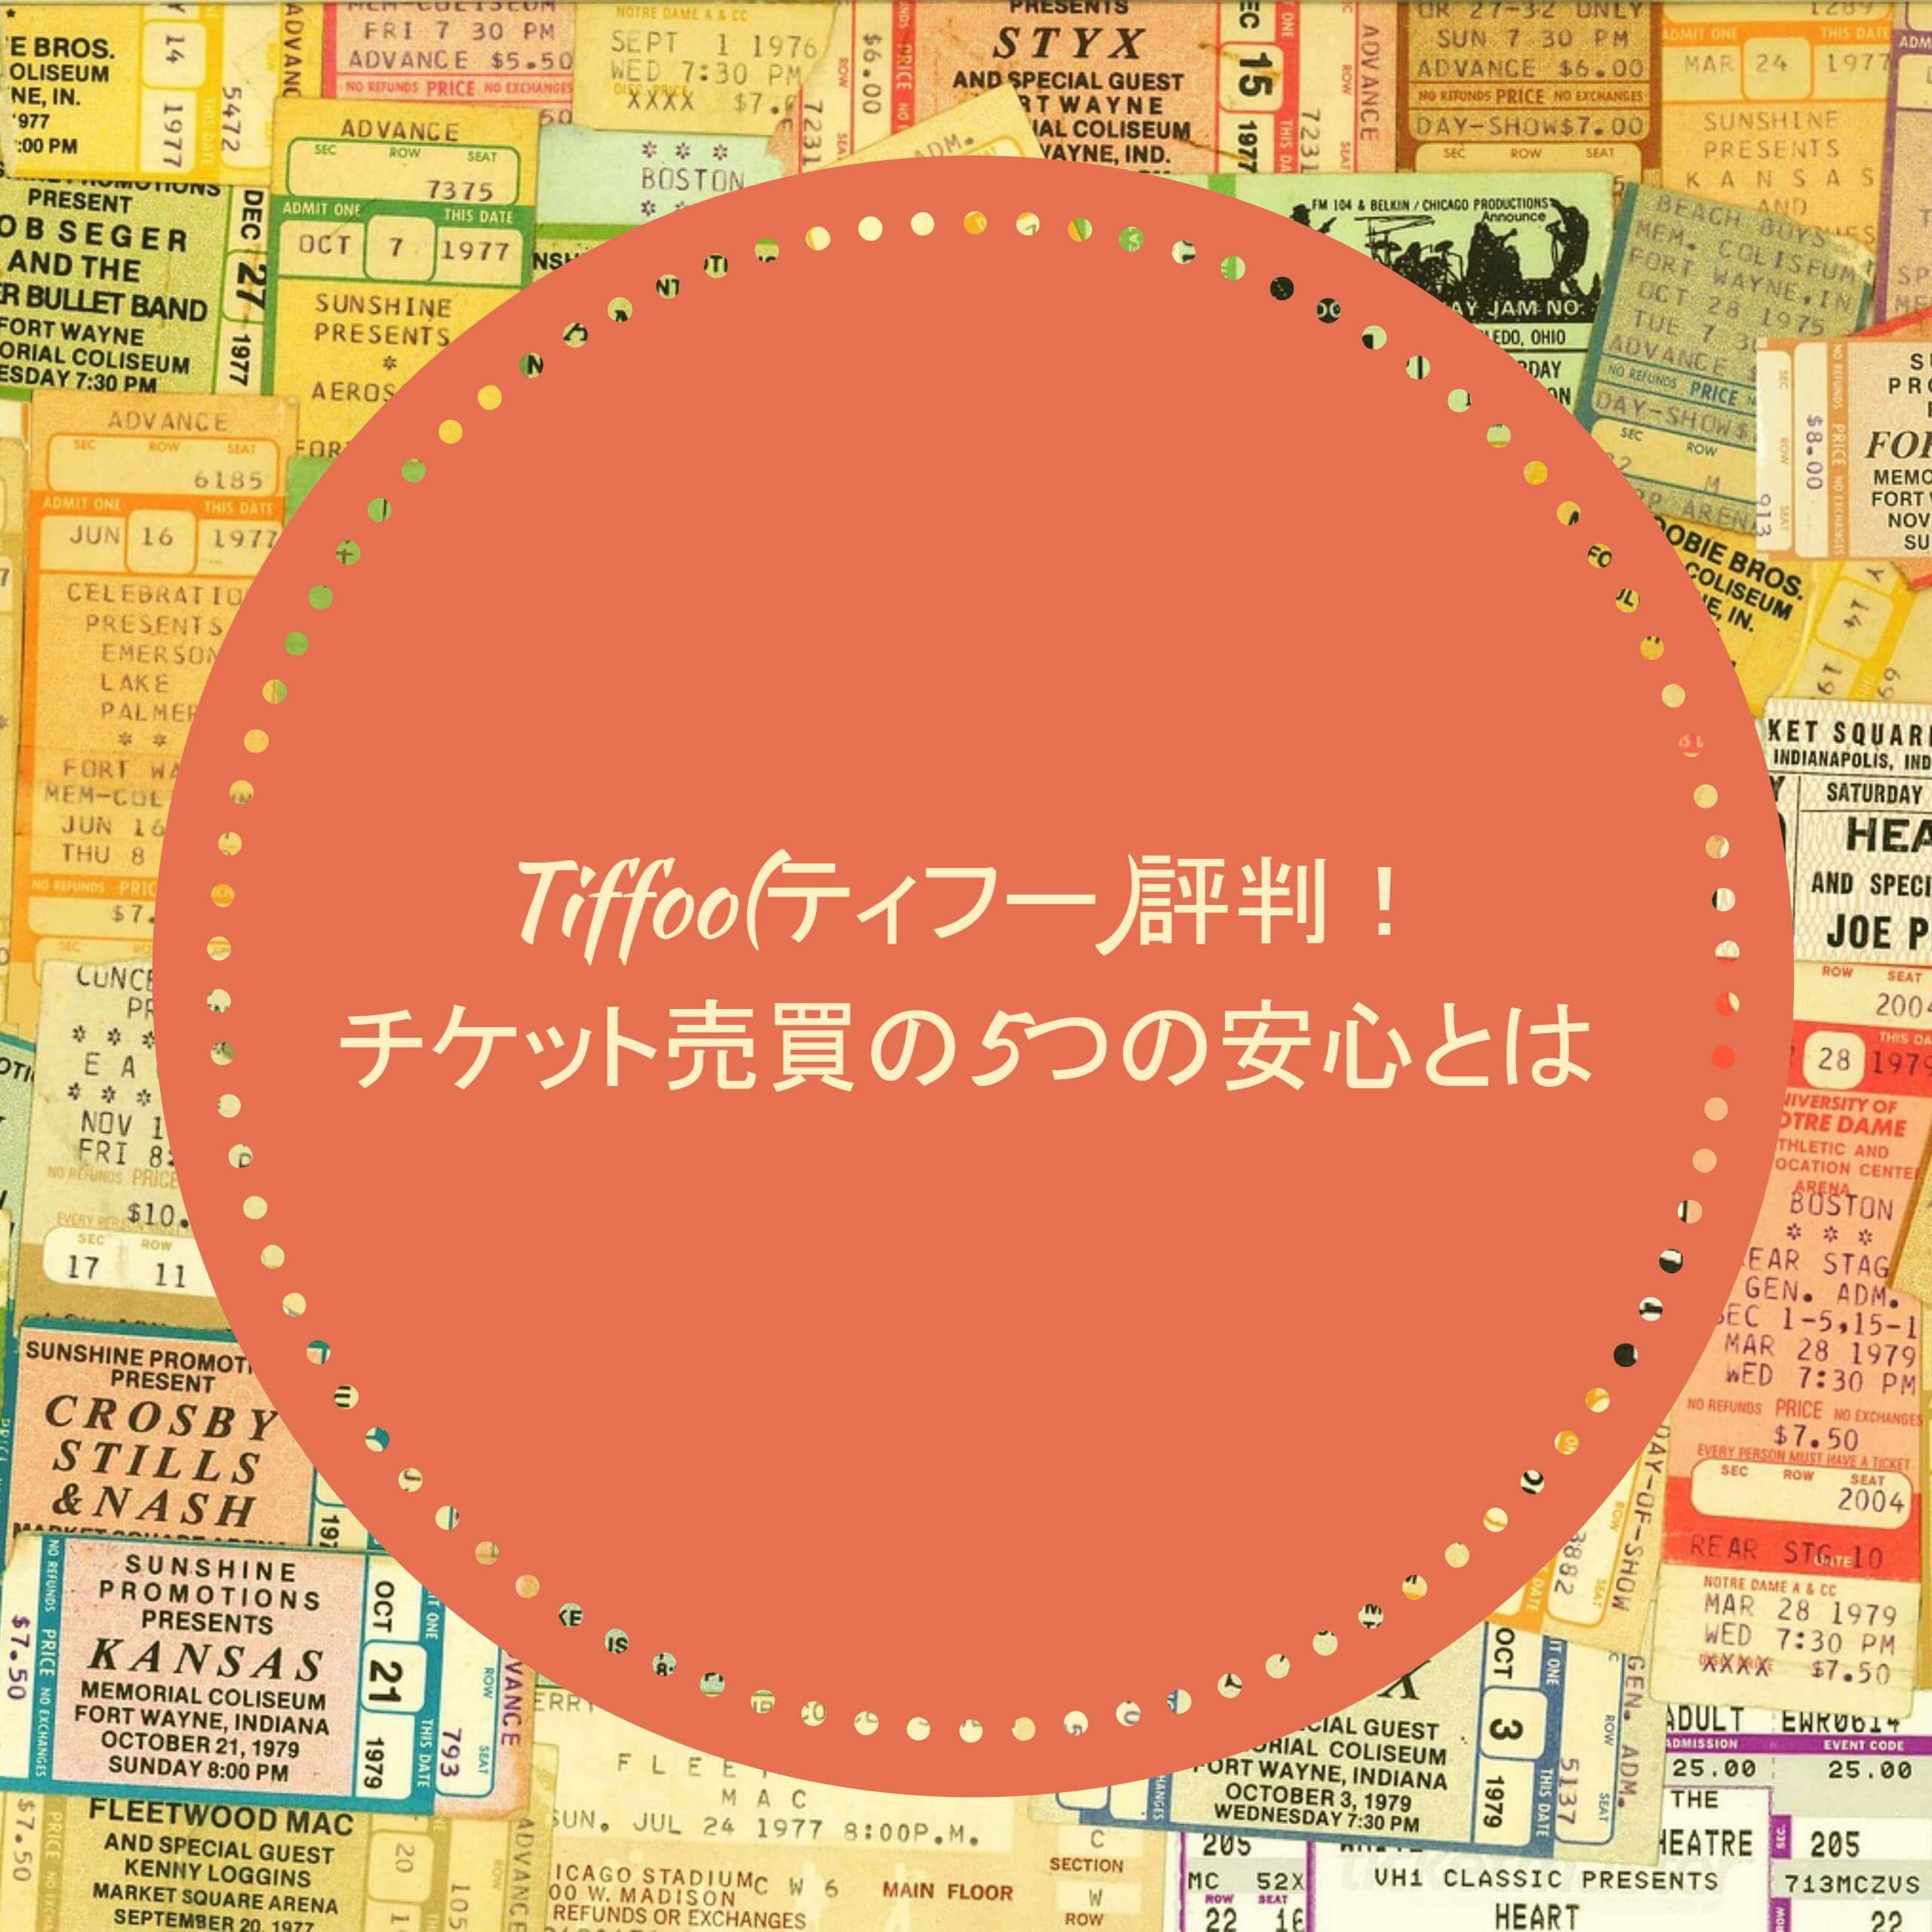 Tiffoo(ティフー)評判!チケット売買の5つの安心とは (1)